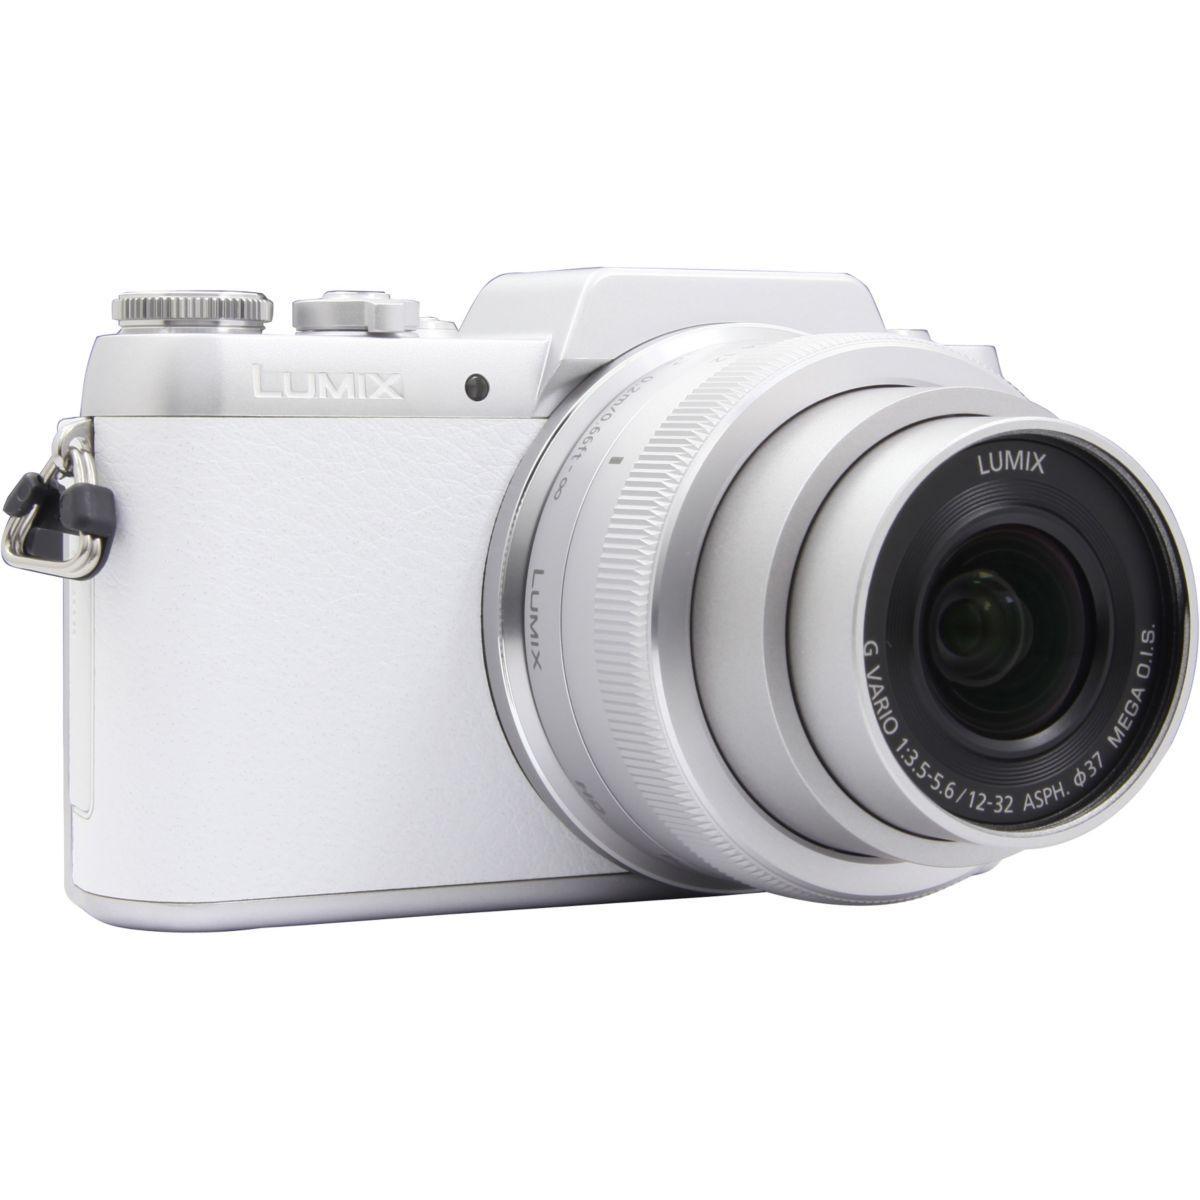 Appareil photo hybride panasonic dmc-gf7 blanc + 12-32mm - livraison offerte : code liv